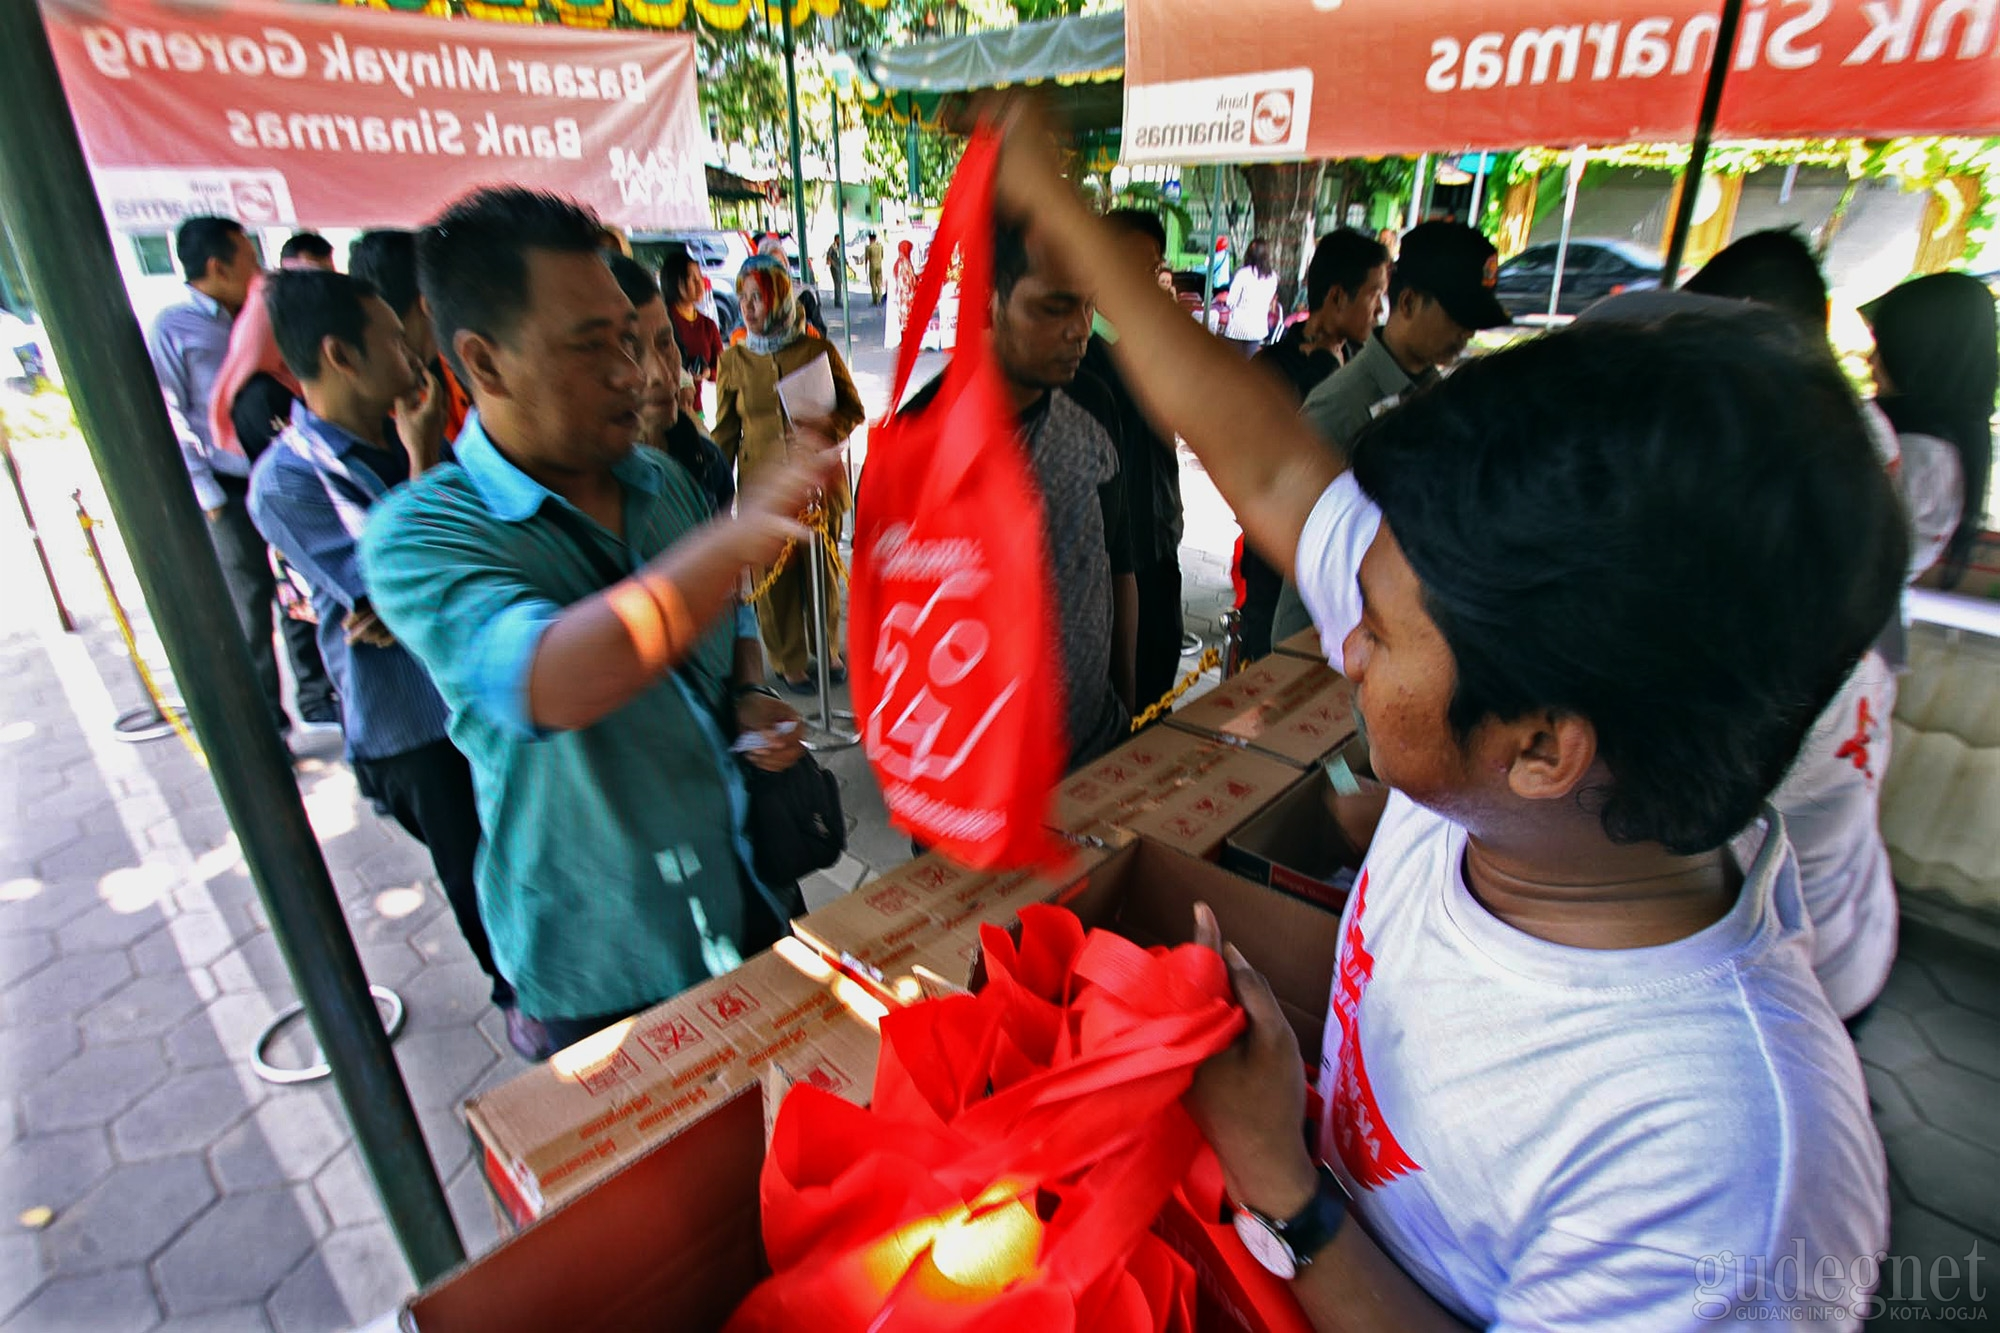 Pemkot Yogyakarta Gandeng Pihak Swasta Gelar Bazar Ramadan